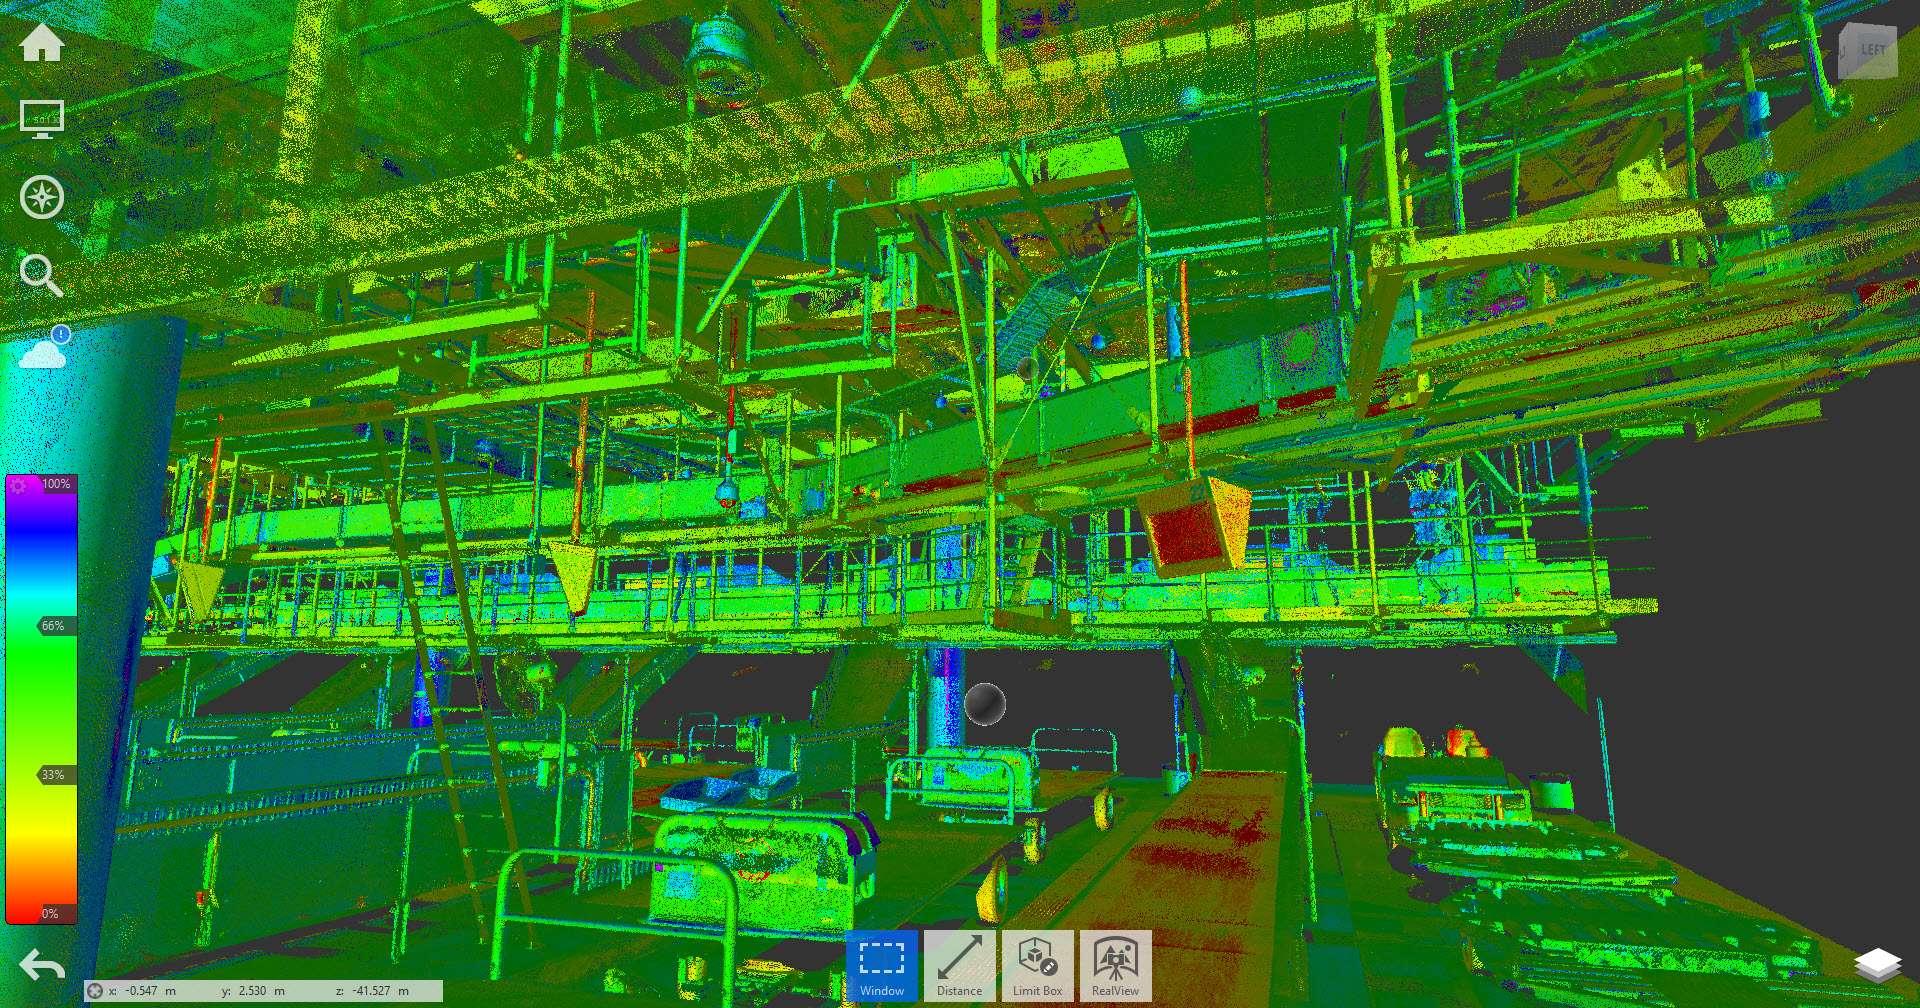 3D Laser Measurement of Baggage Handling Systems 2 - Scan Hub